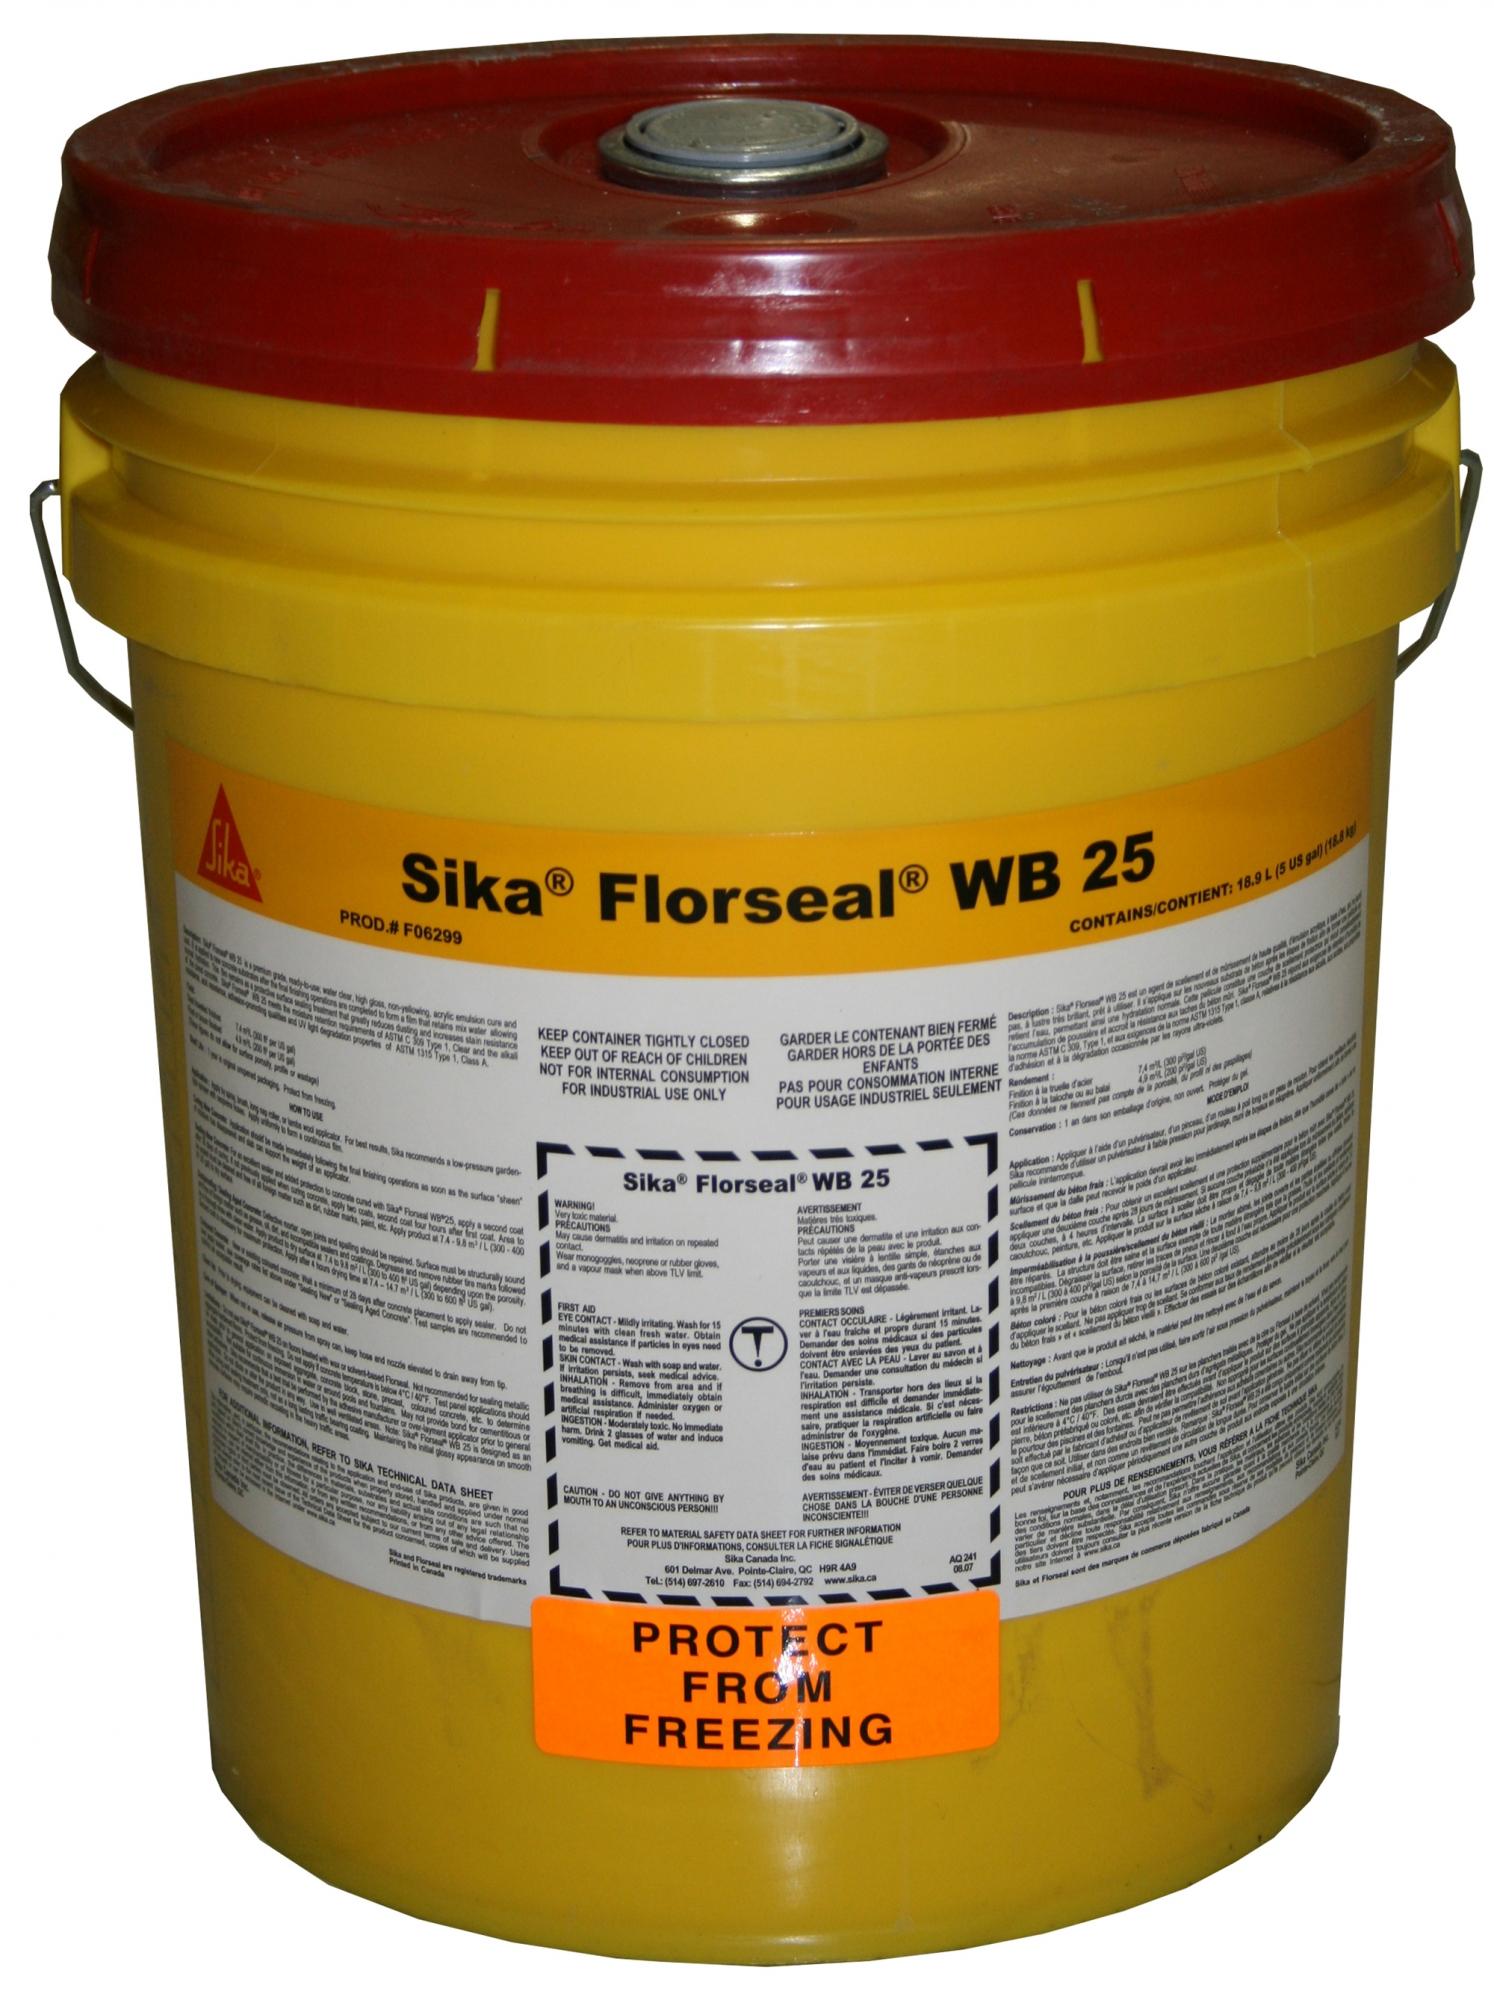 Sika Florseal Wb 25 Nca